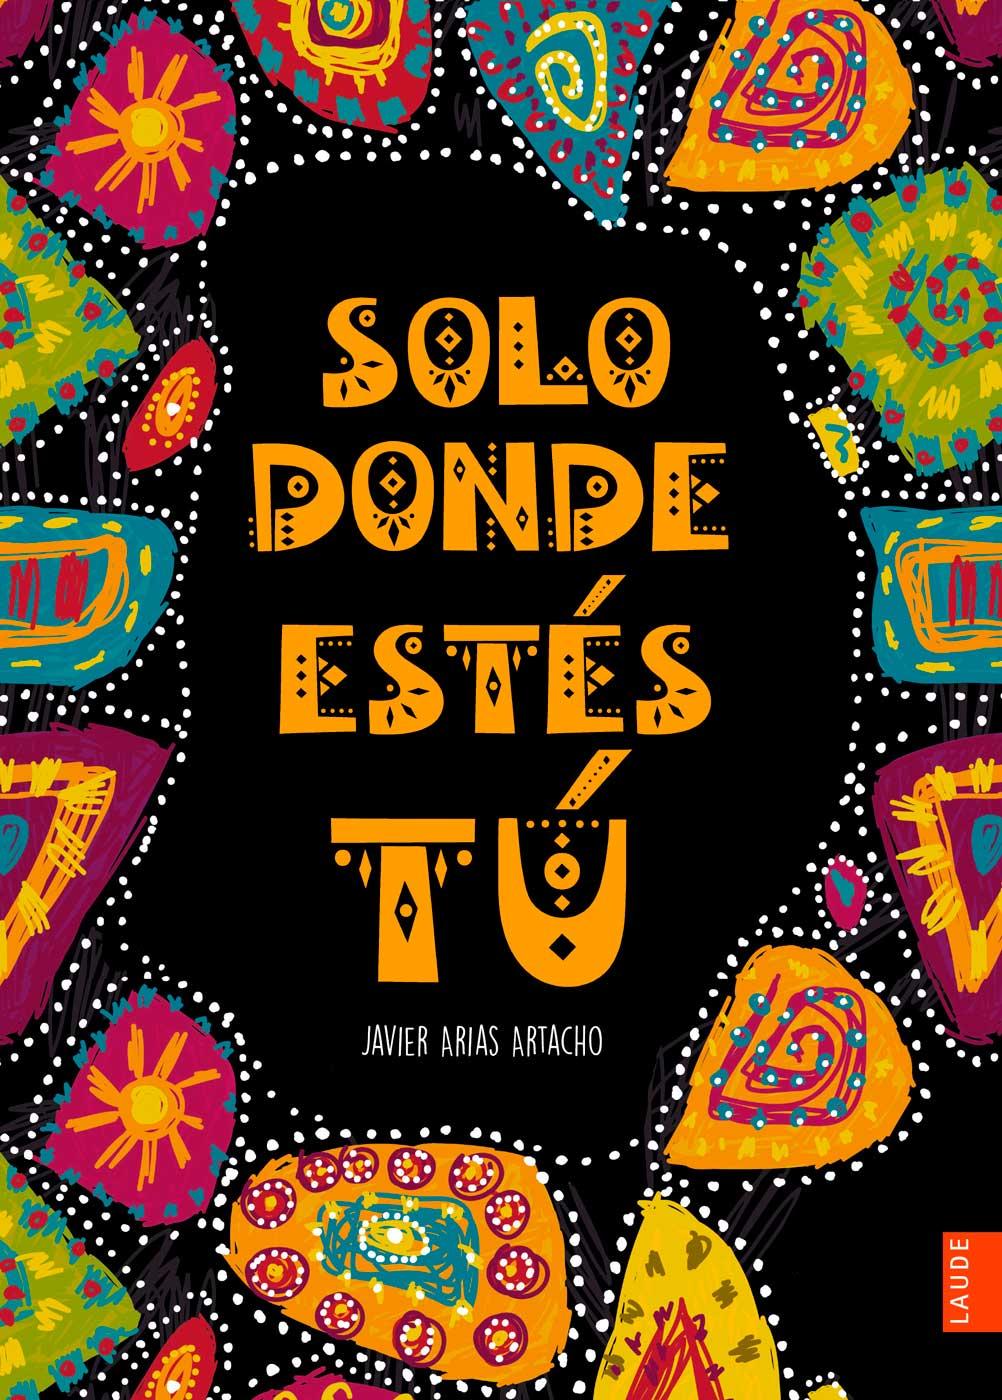 https://cdn.edelvives.es/docs/catalogo/7065/imgs/original/157914_Cub_SoloDondeEstesTu_Web.jpg